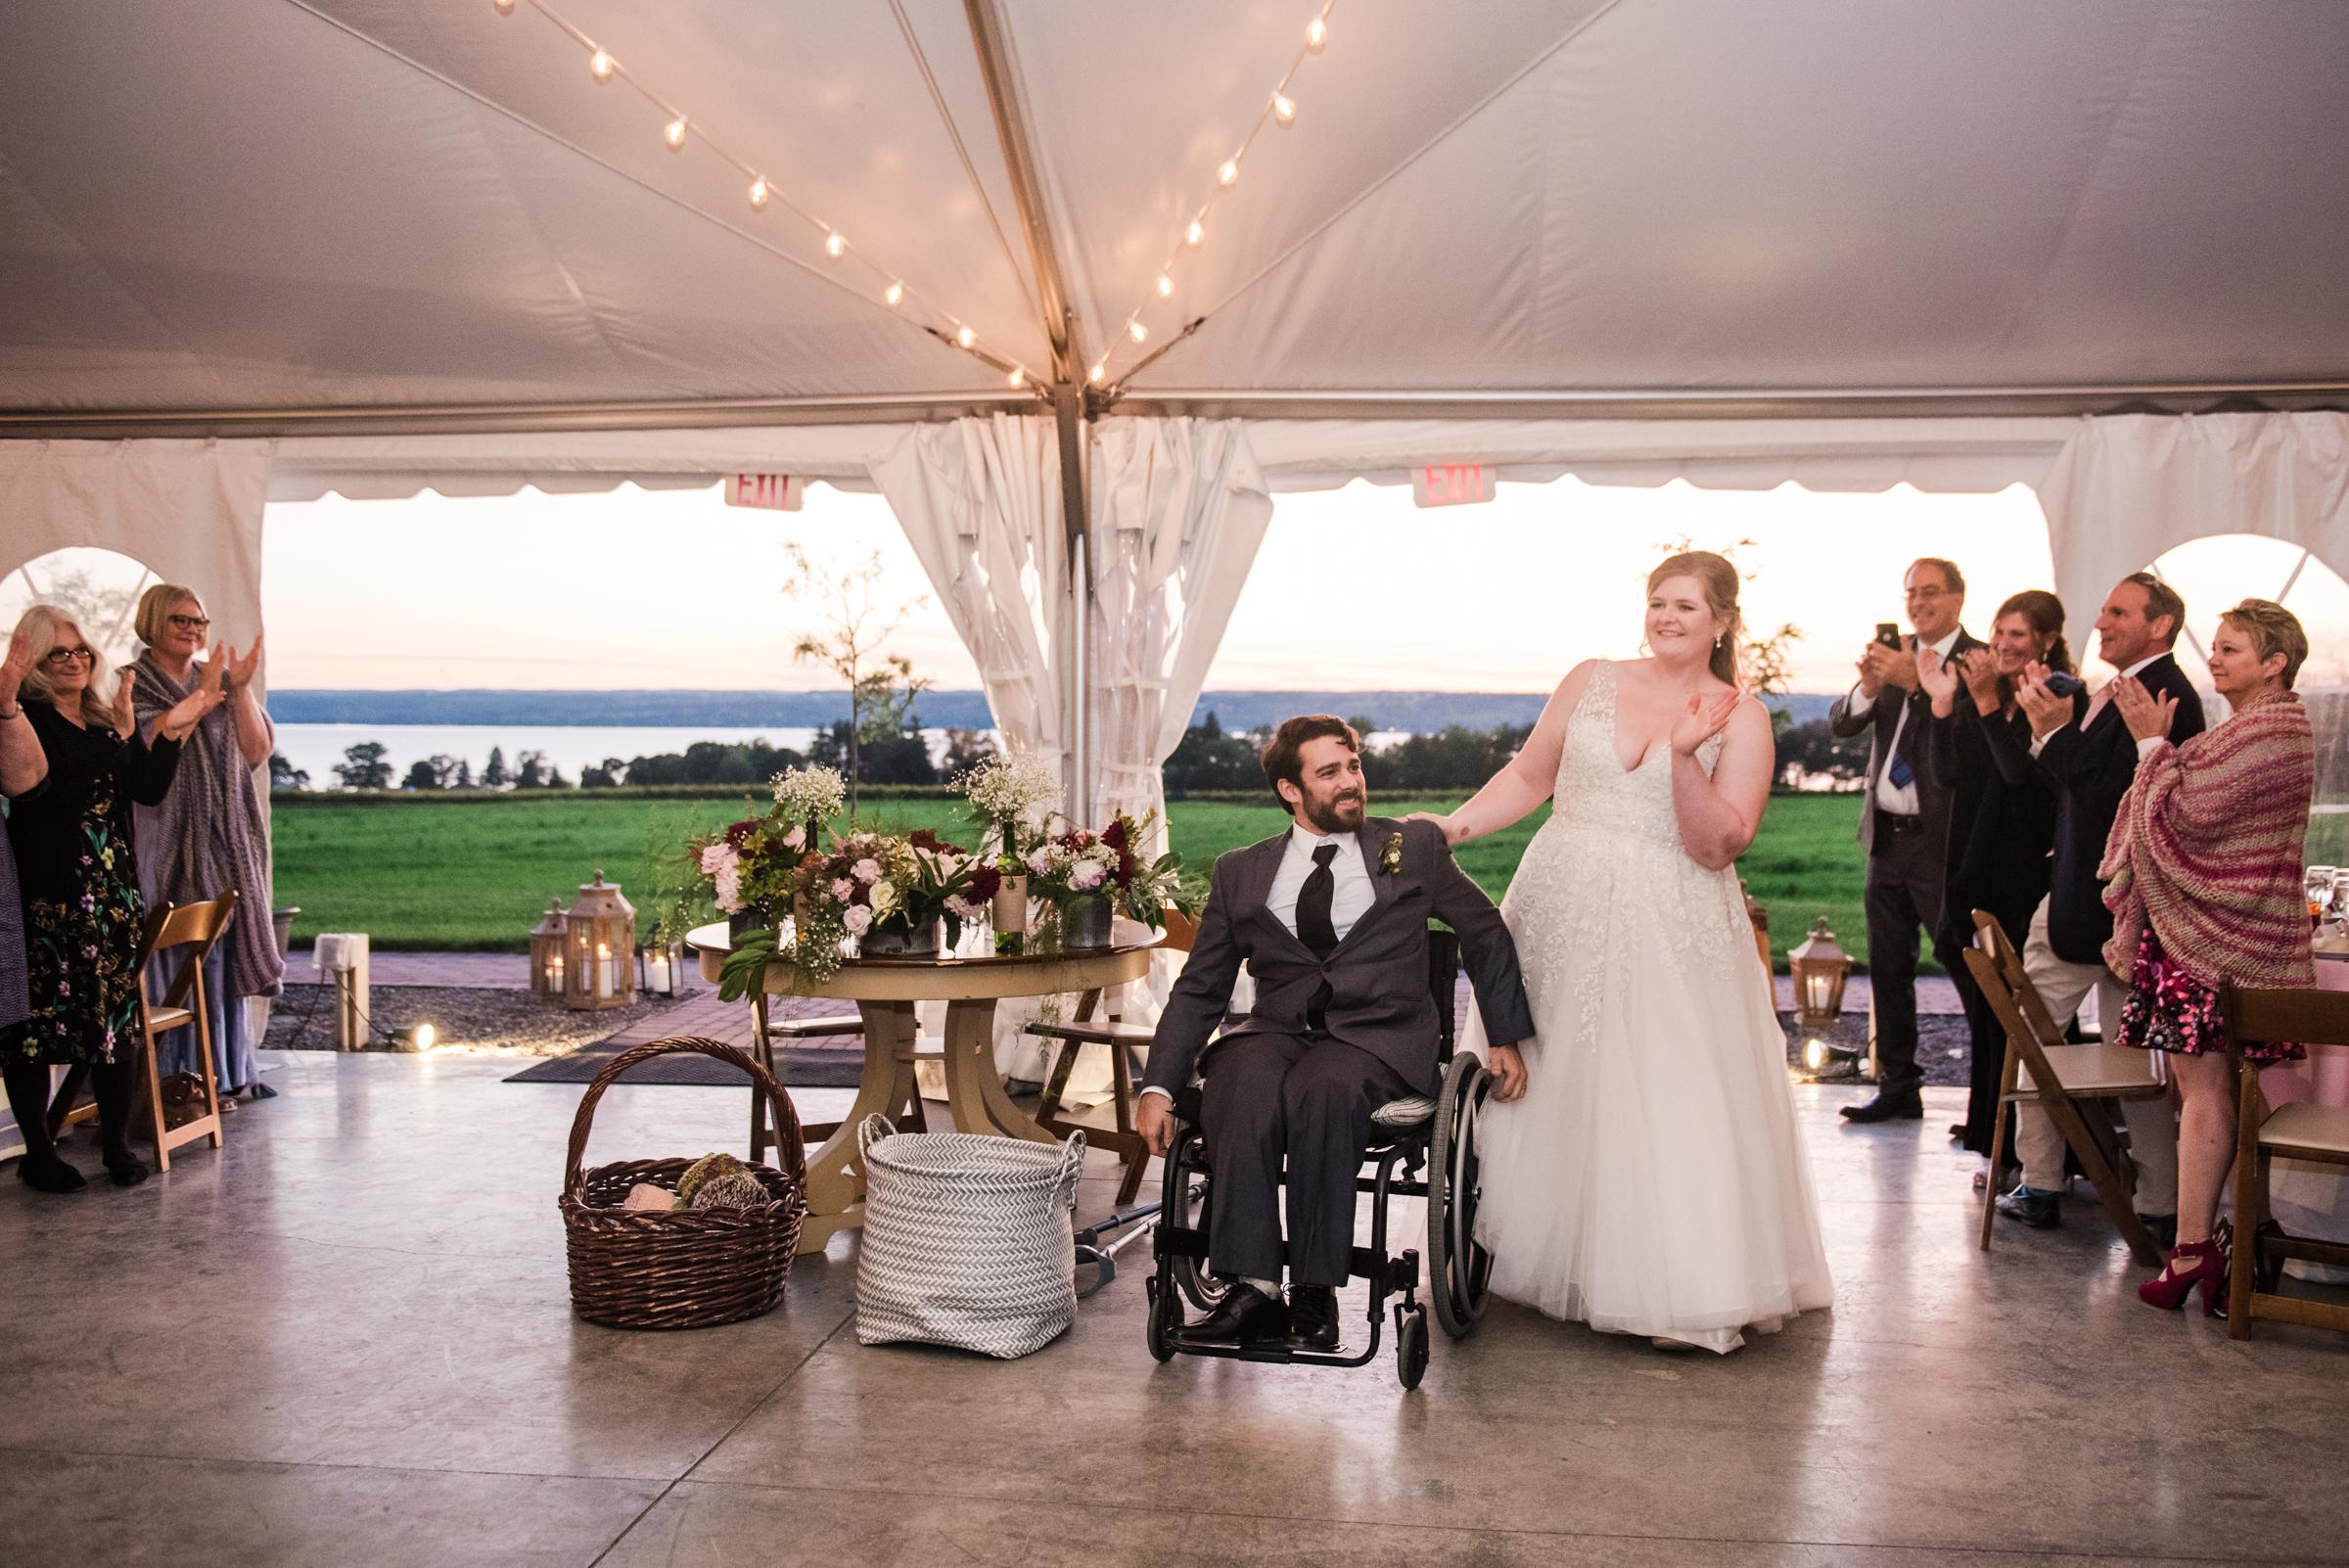 Zugibe_Vineyards_Finger_Lakes_Wedding_JILL_STUDIO_Rochester_NY_Photographer_DSC_4241.jpg